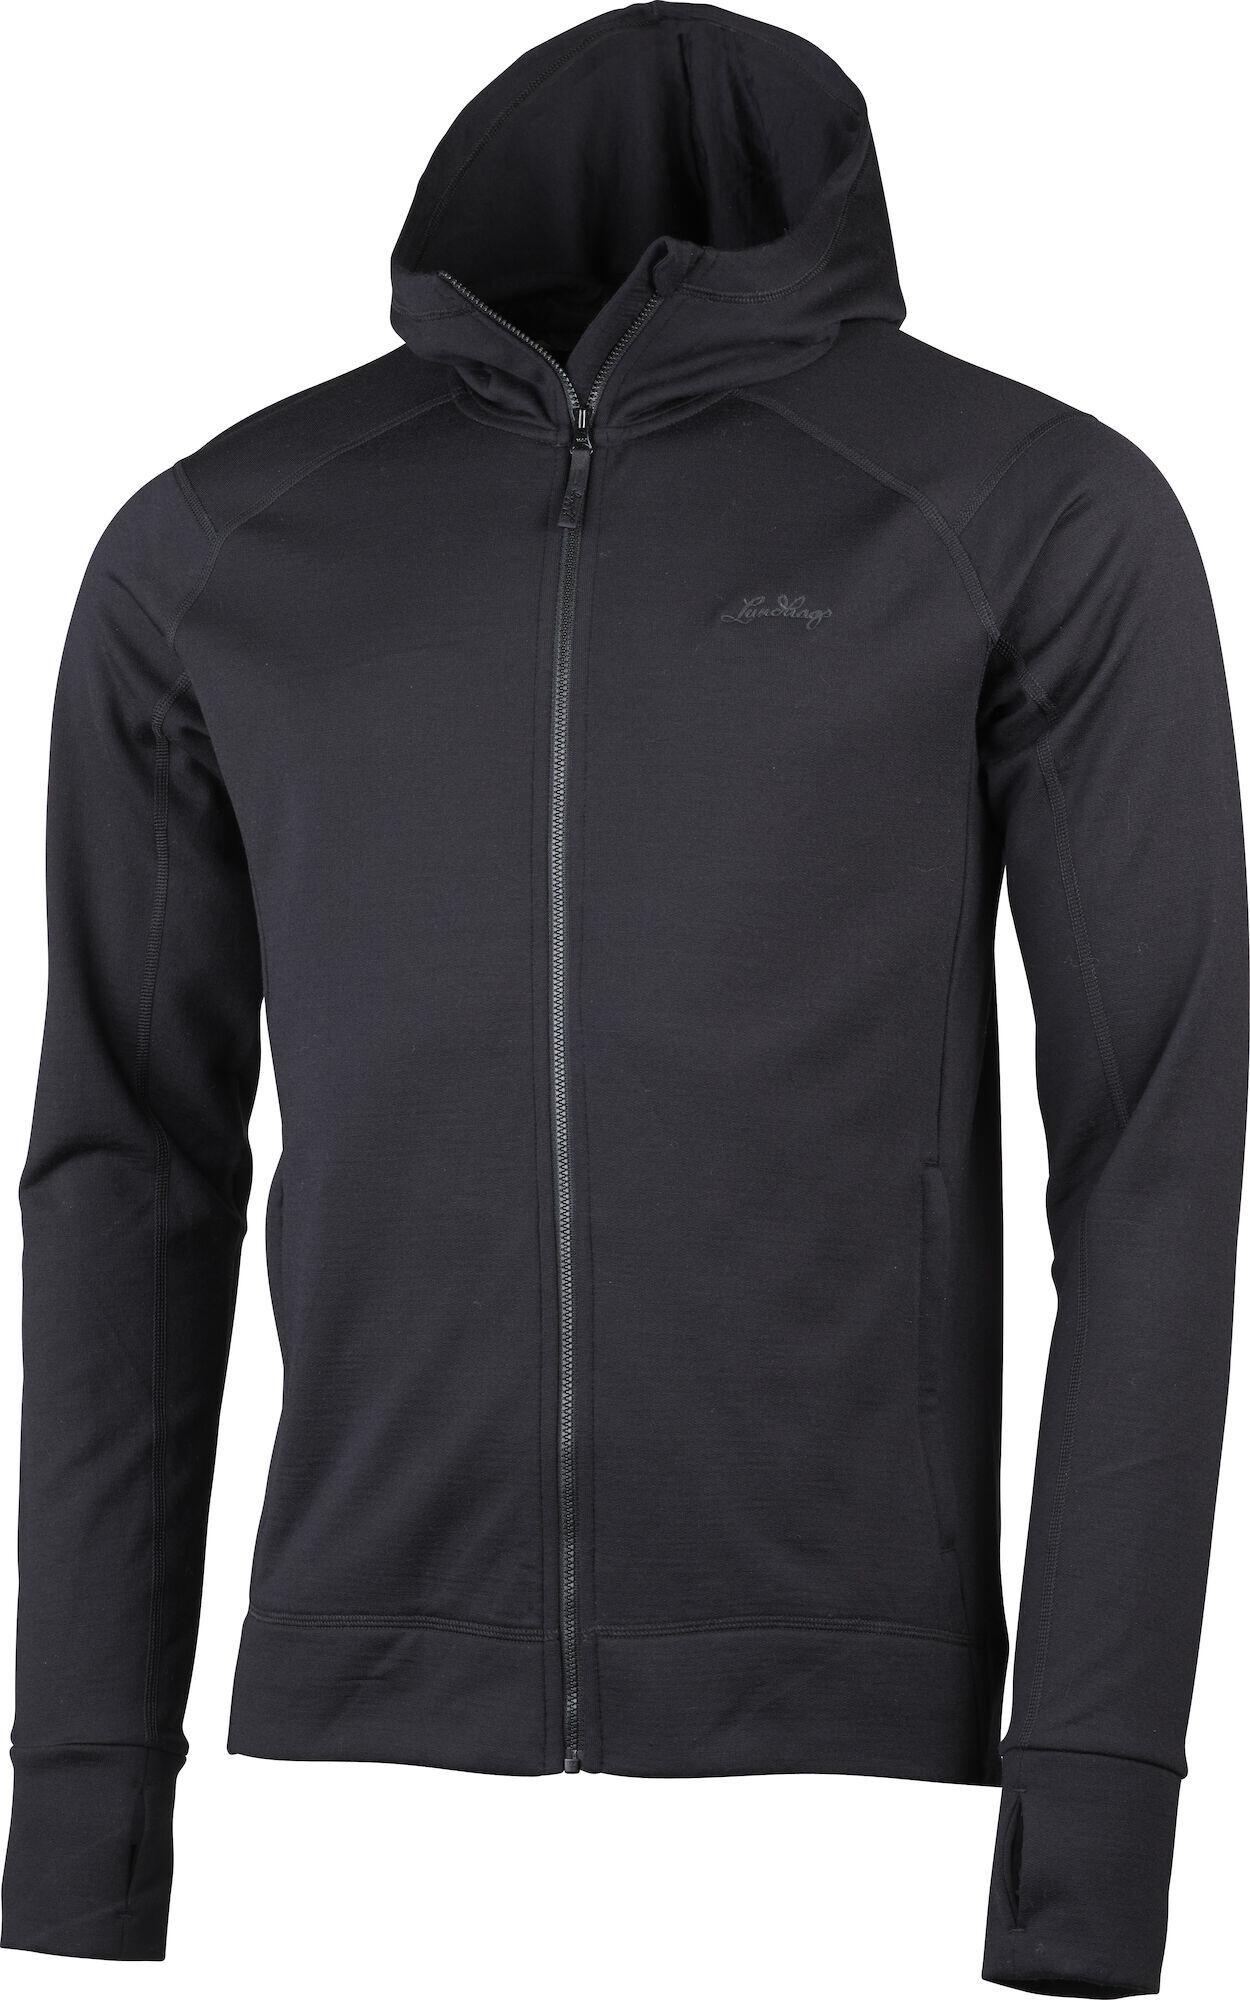 Bergans Myrull Jacket Herr grey melange